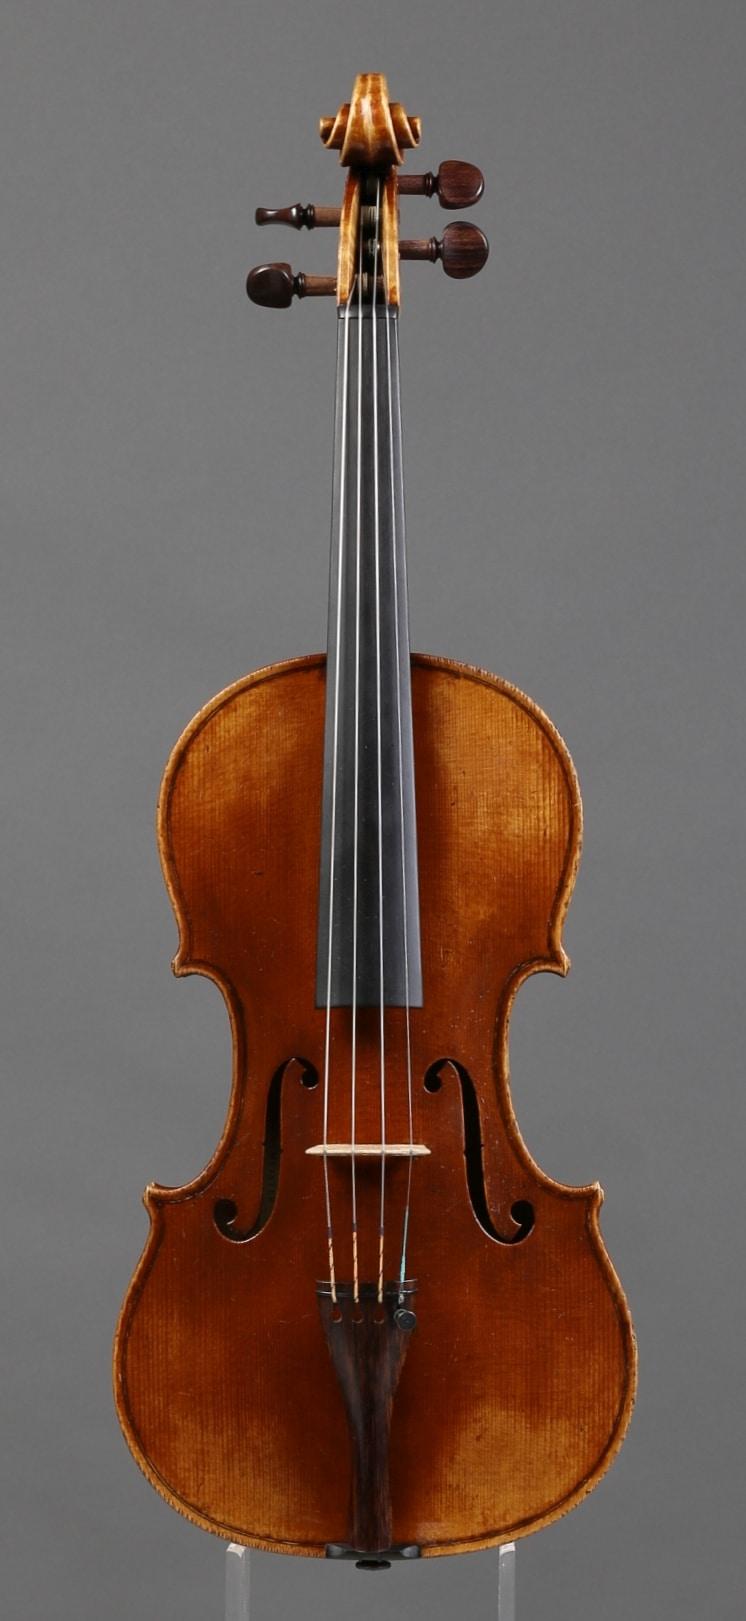 Strings_Music_Horizons_Felix_Krafft_violin_for_sale_front66